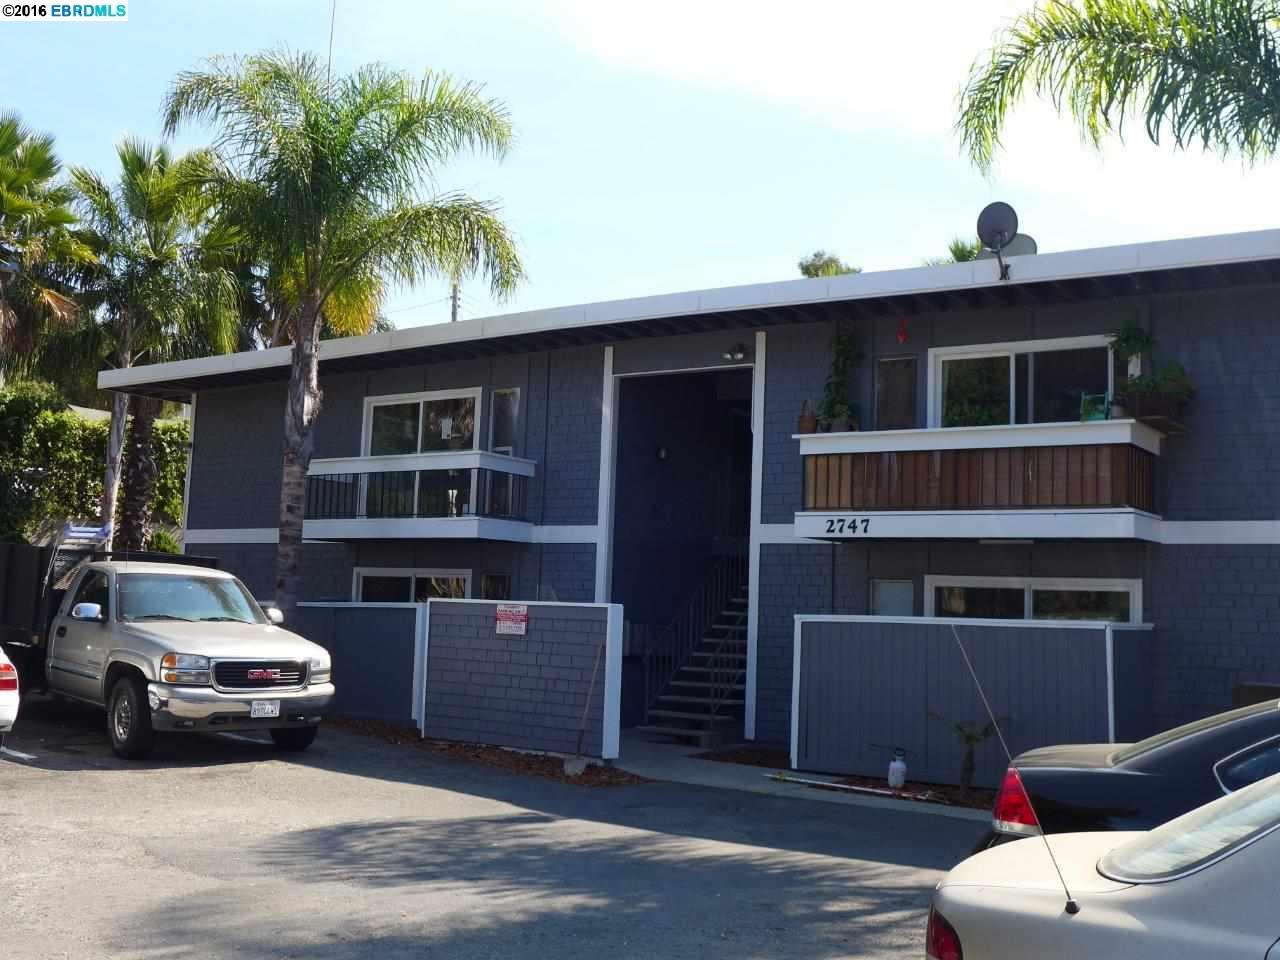 Multi-Family Home for Sale at 2743 Nicol Avenue Oakland, California 94602 United States